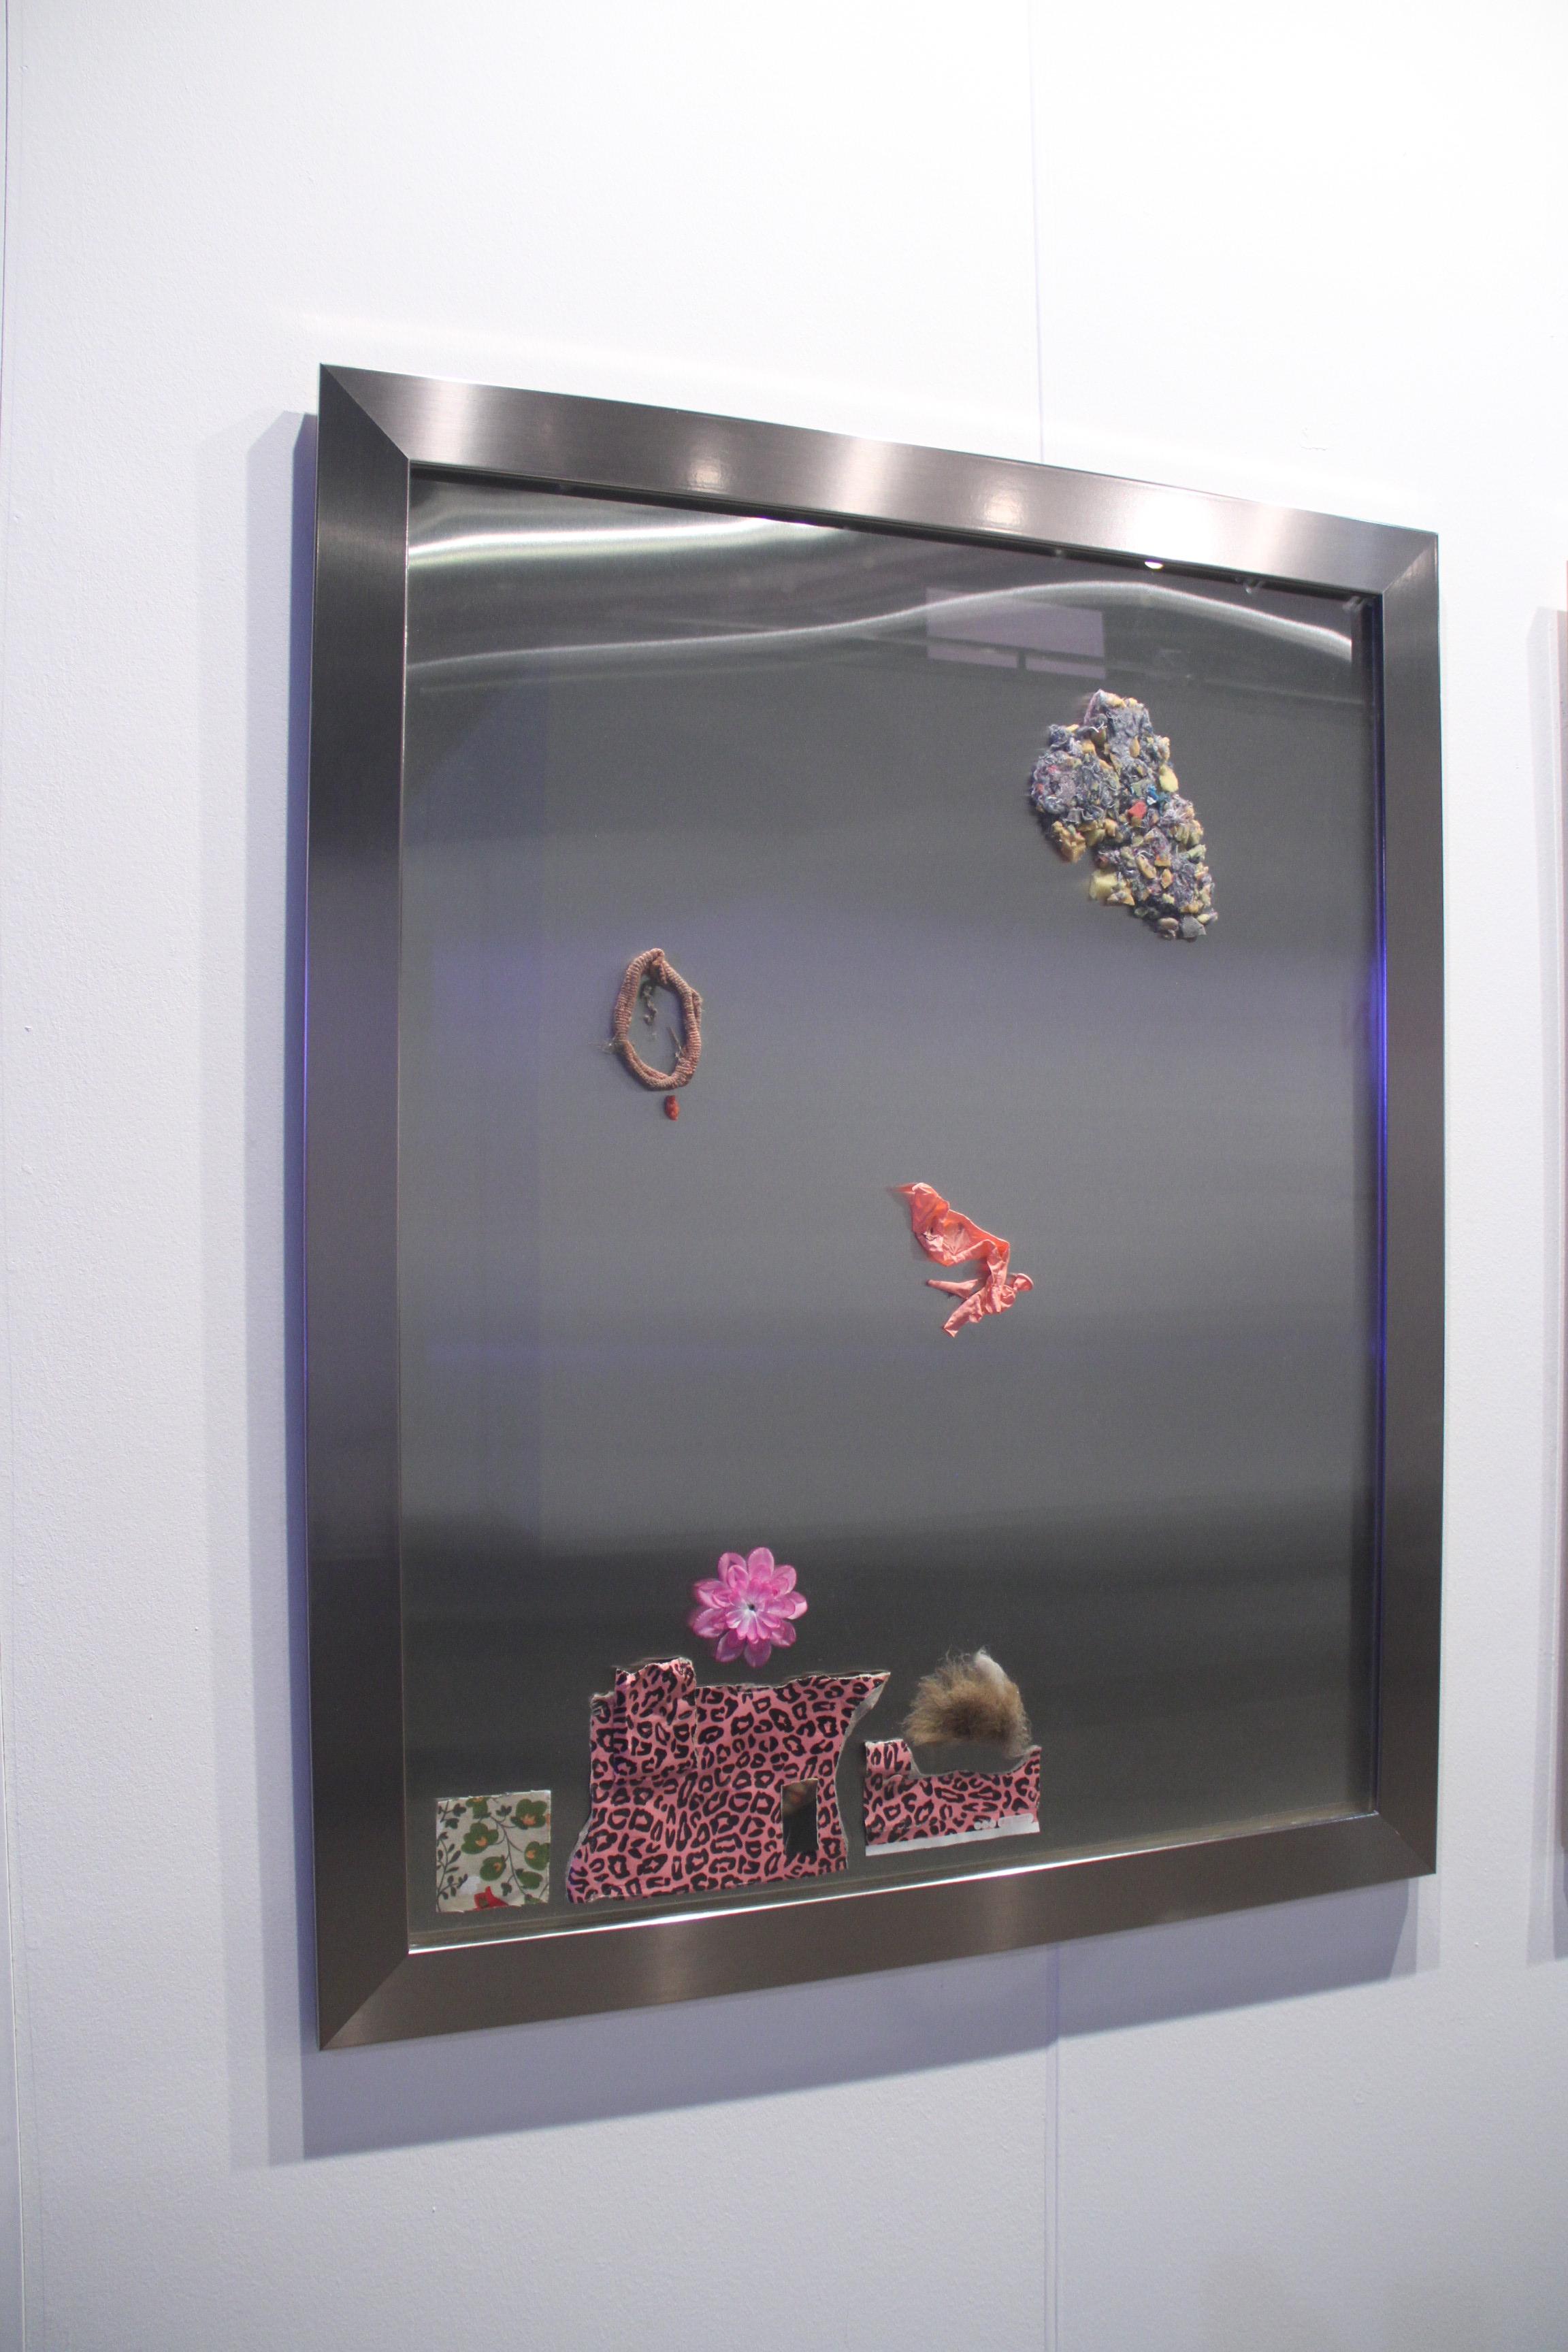 2015. ADQUISICION MUSEO FRANKLIN RAWSON DE SAN JUAN